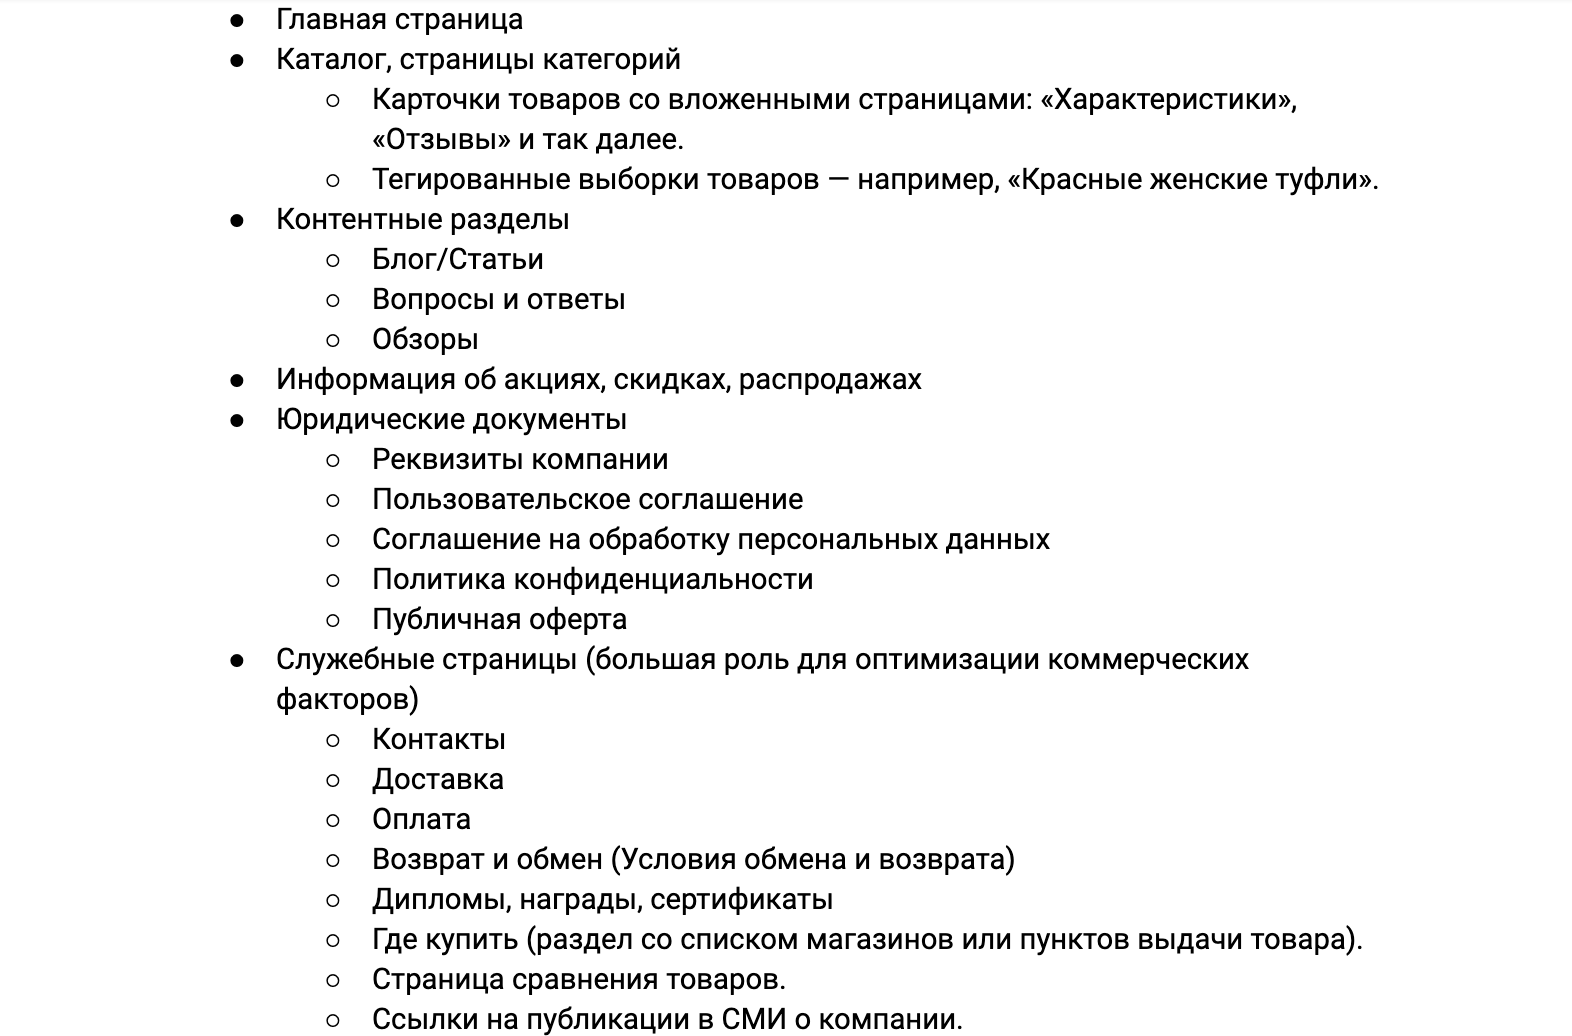 Стандартная структура интернет-магазина